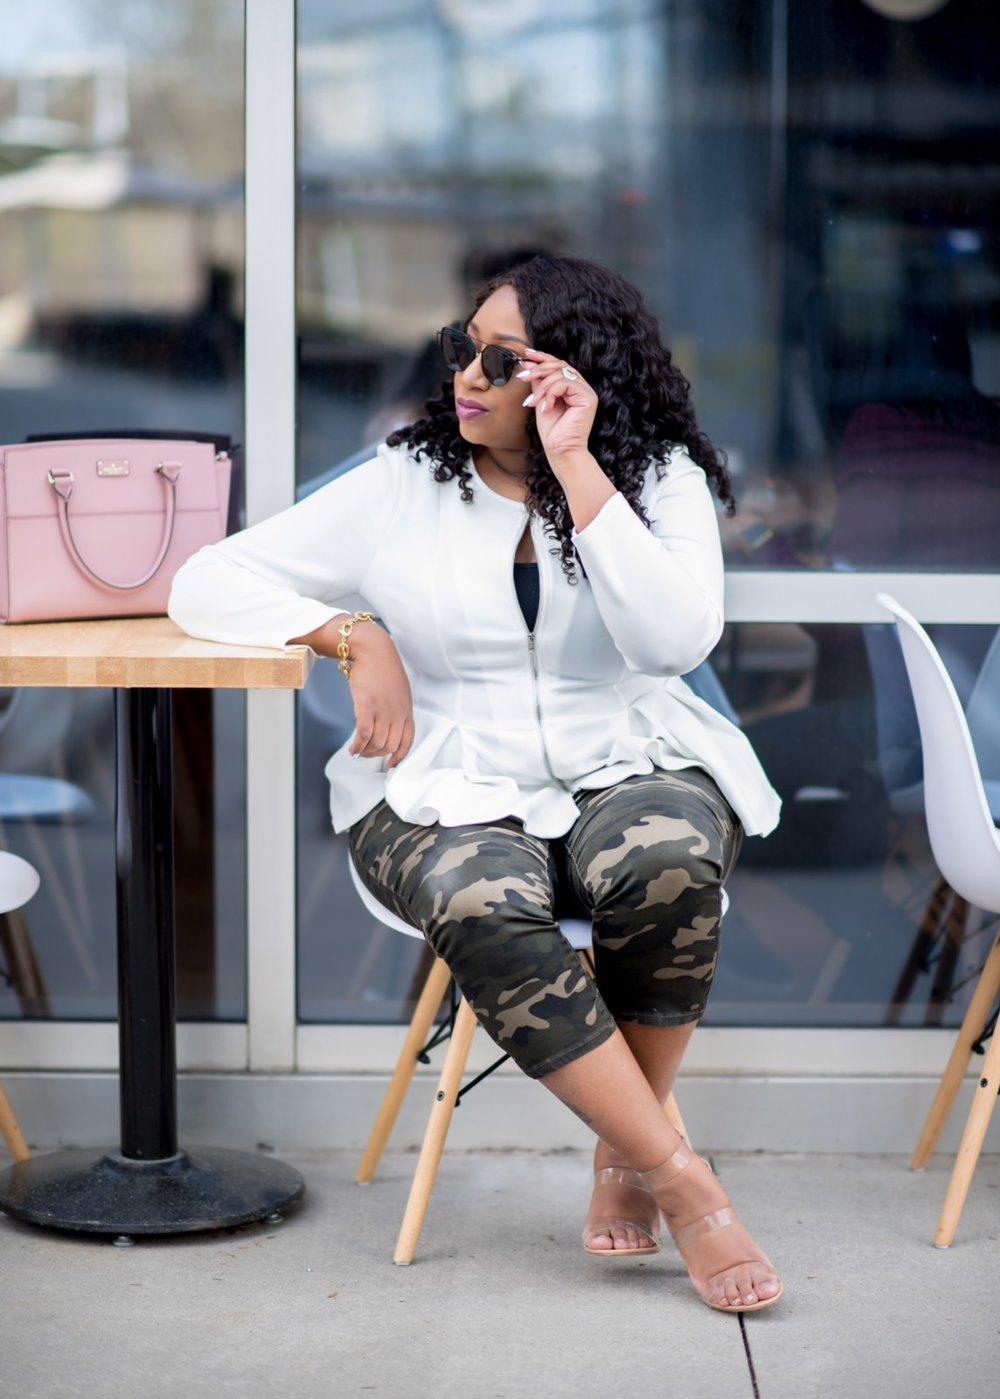 - September 2018 - Boss Lady BrandAugust 2018 - Jessica Hunt PhotographyAugust 2018 - Pink BlushApril 2018 - Denise Benson PhotographyApril 2018 - Corporate CurveJune 2017 - Denise Benson Photography